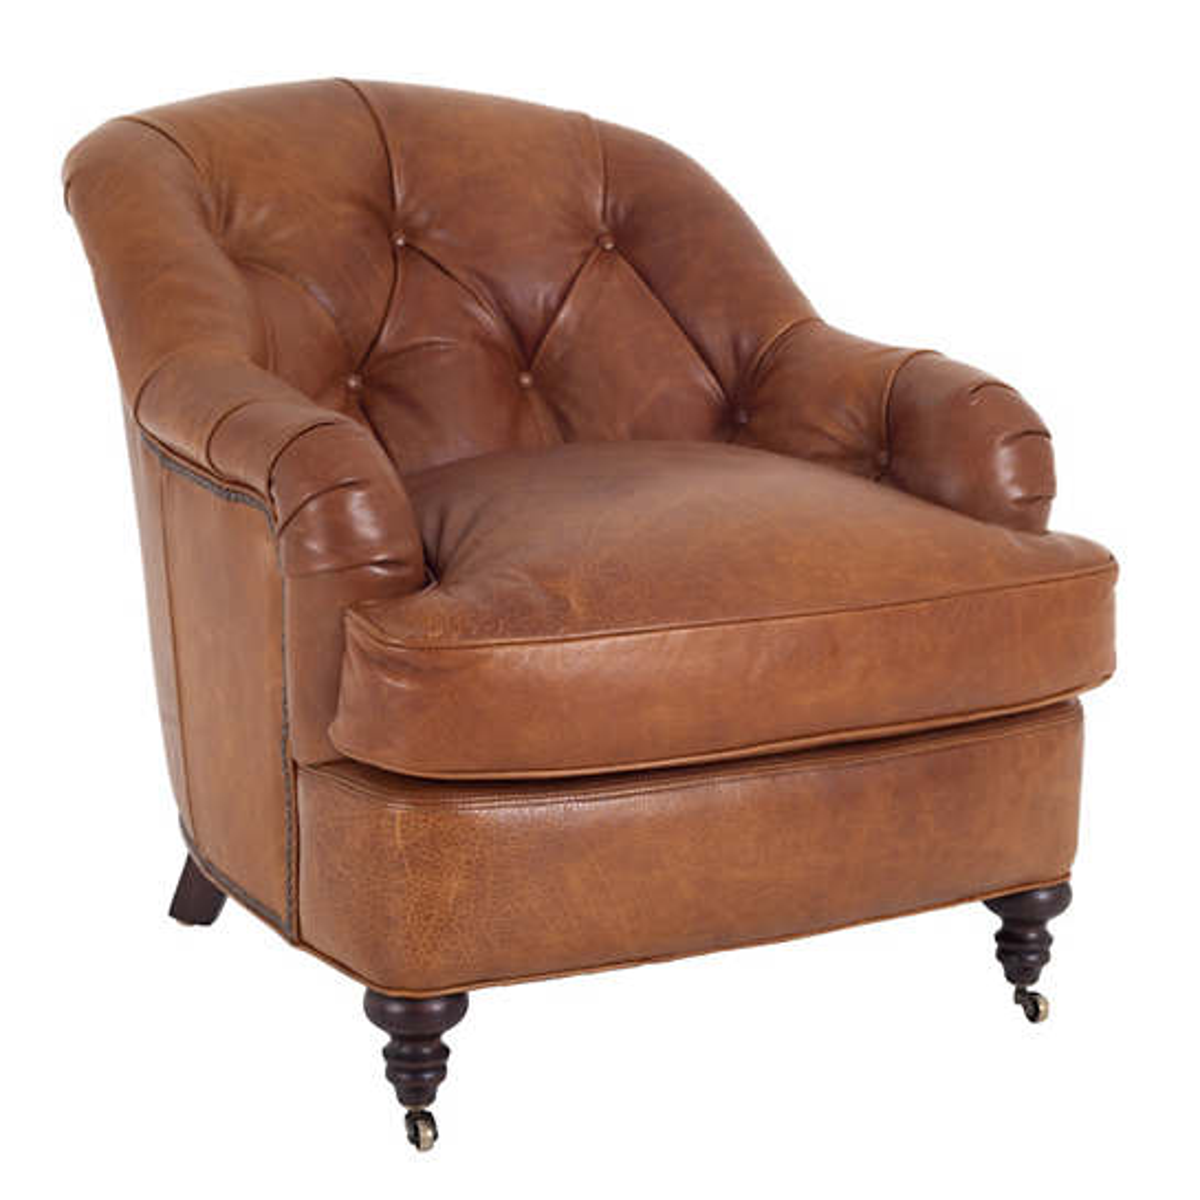 Madrid Chestnut Leather Norfolk Chair